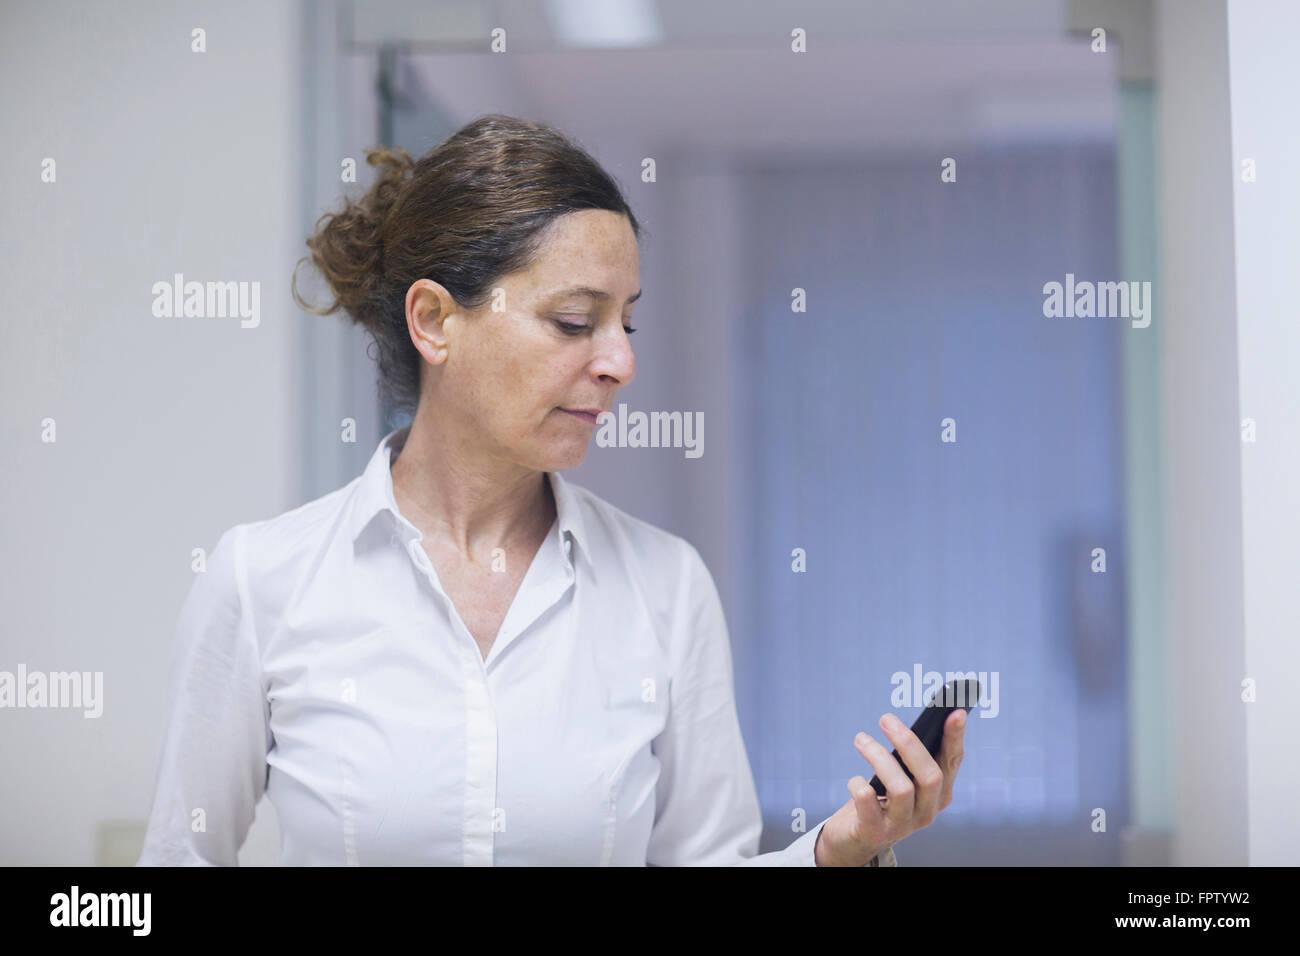 Female physiotherapist reading message on a mobile phone, Freiburg Im Breisgau, Baden-Württemberg, Germany - Stock Image